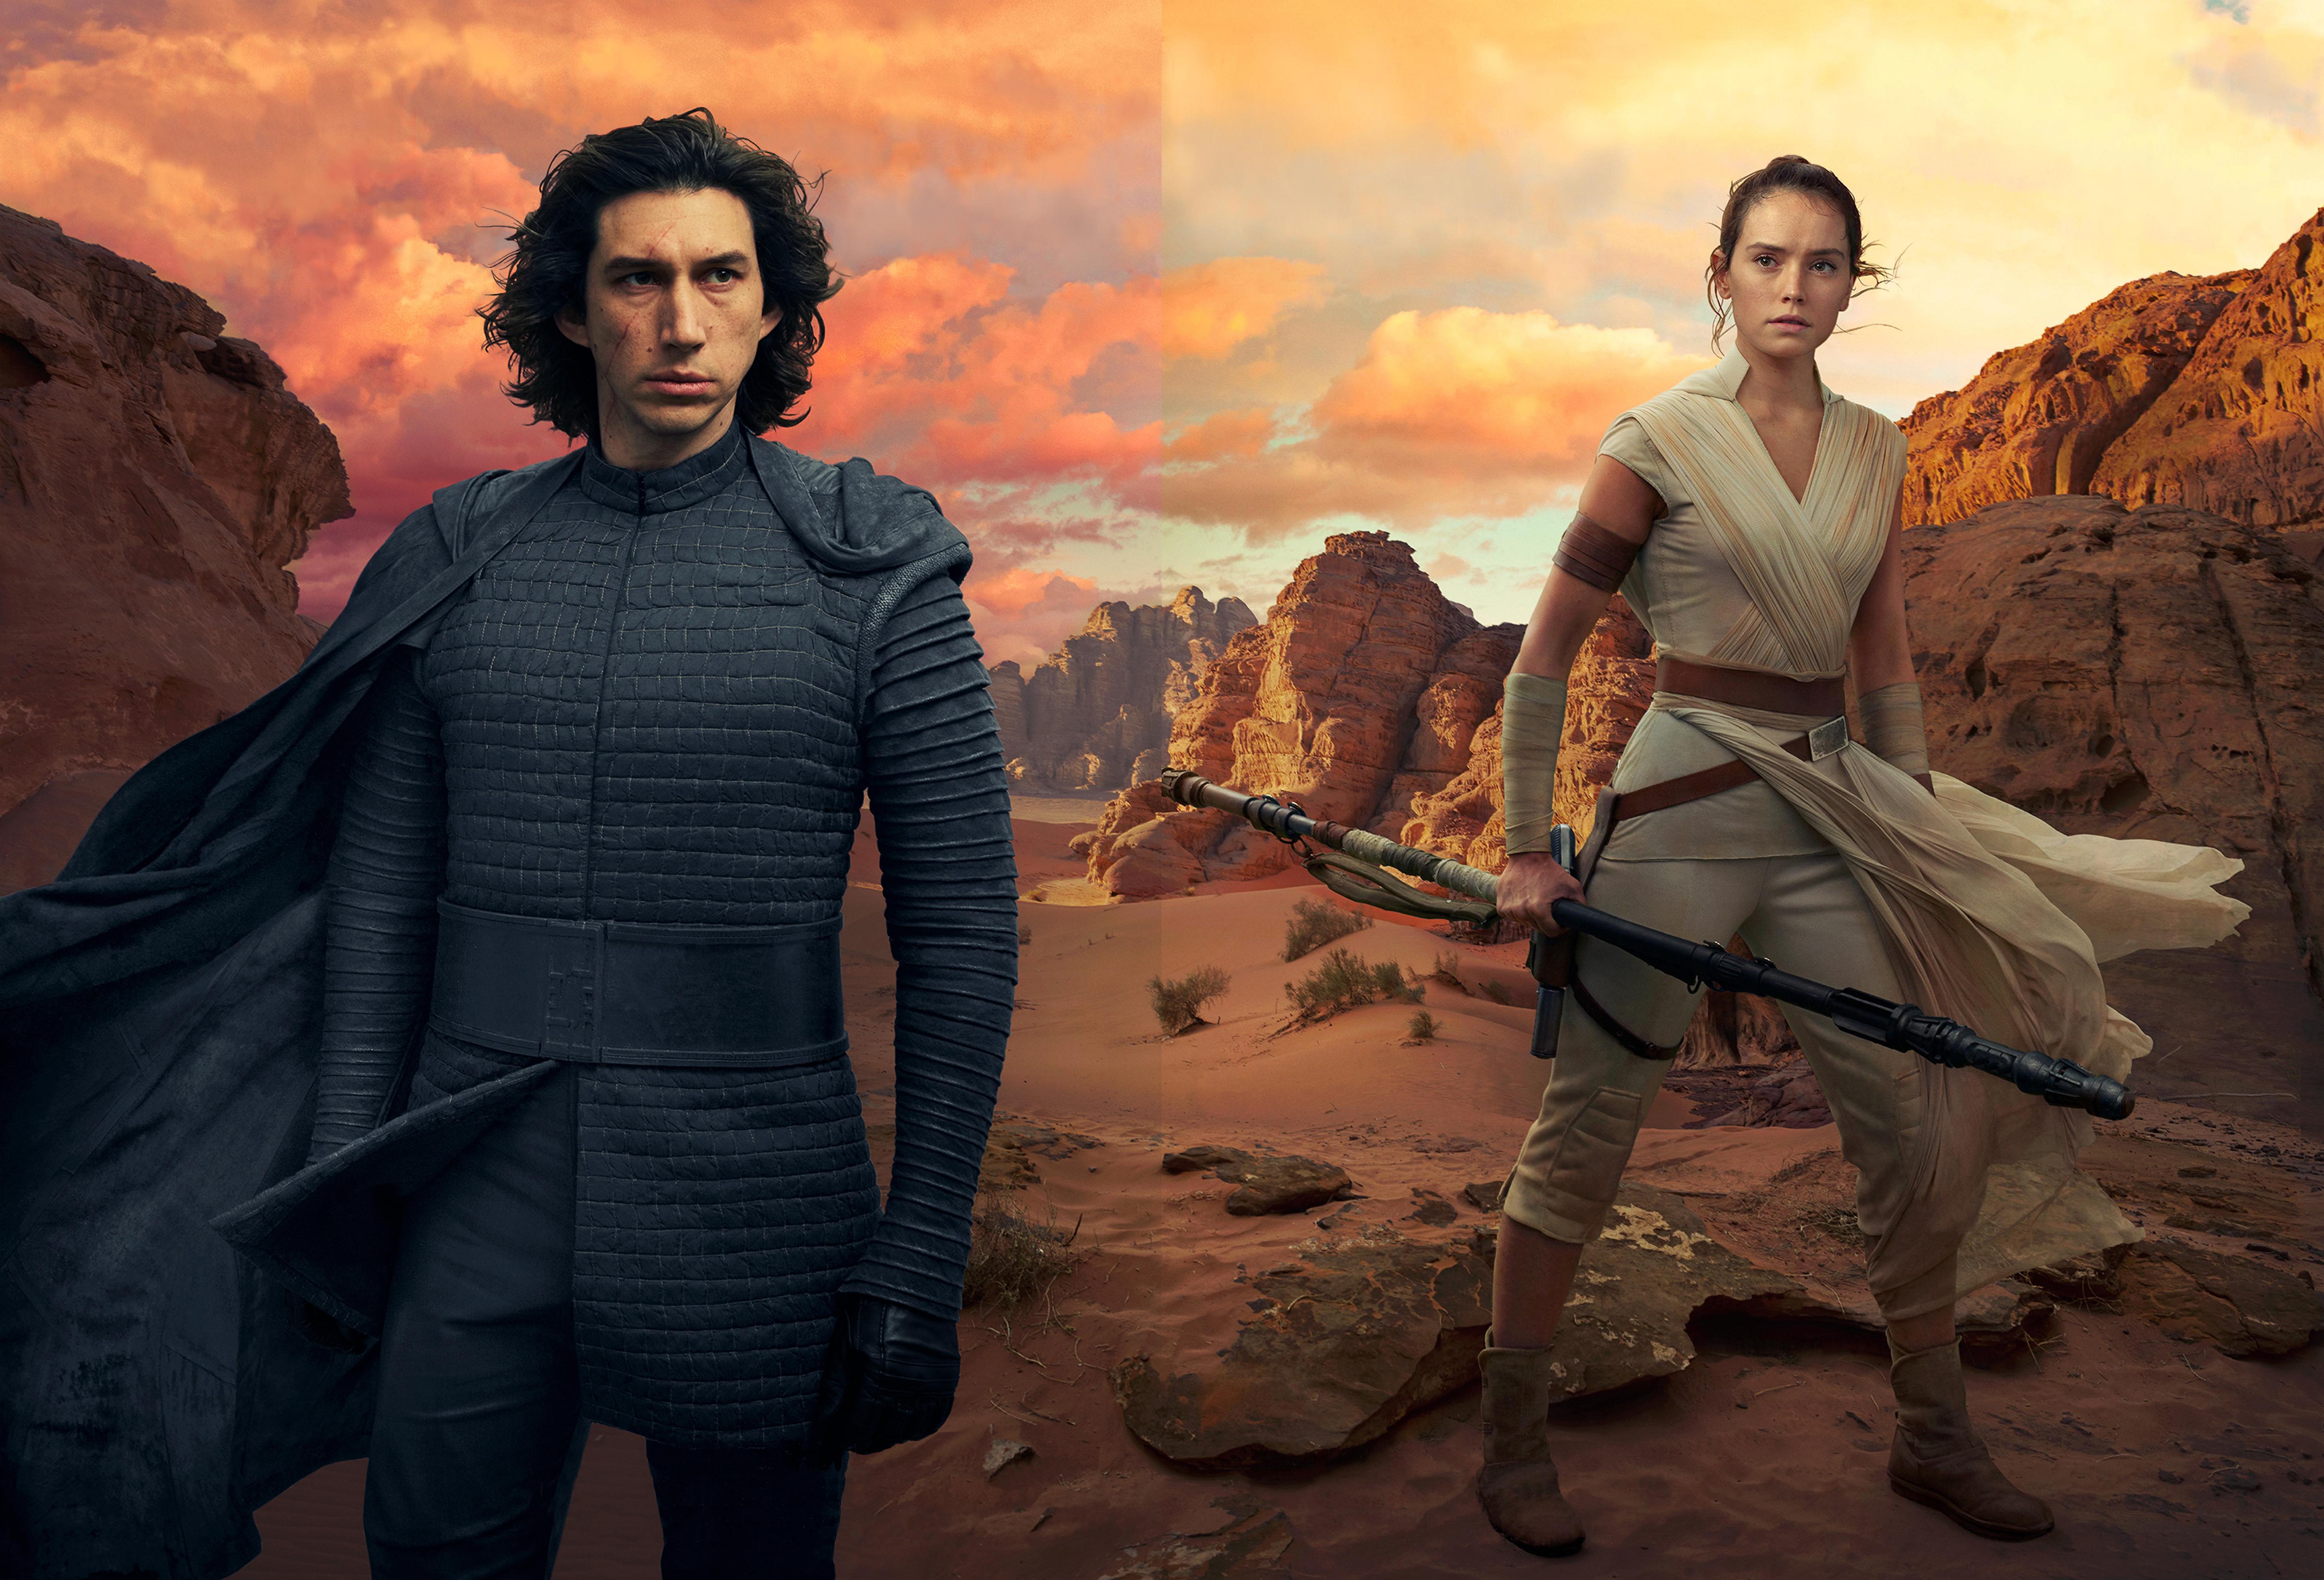 Star Wars The Rise Of Skywalker 5882x4000 Wallpaper Teahub Io